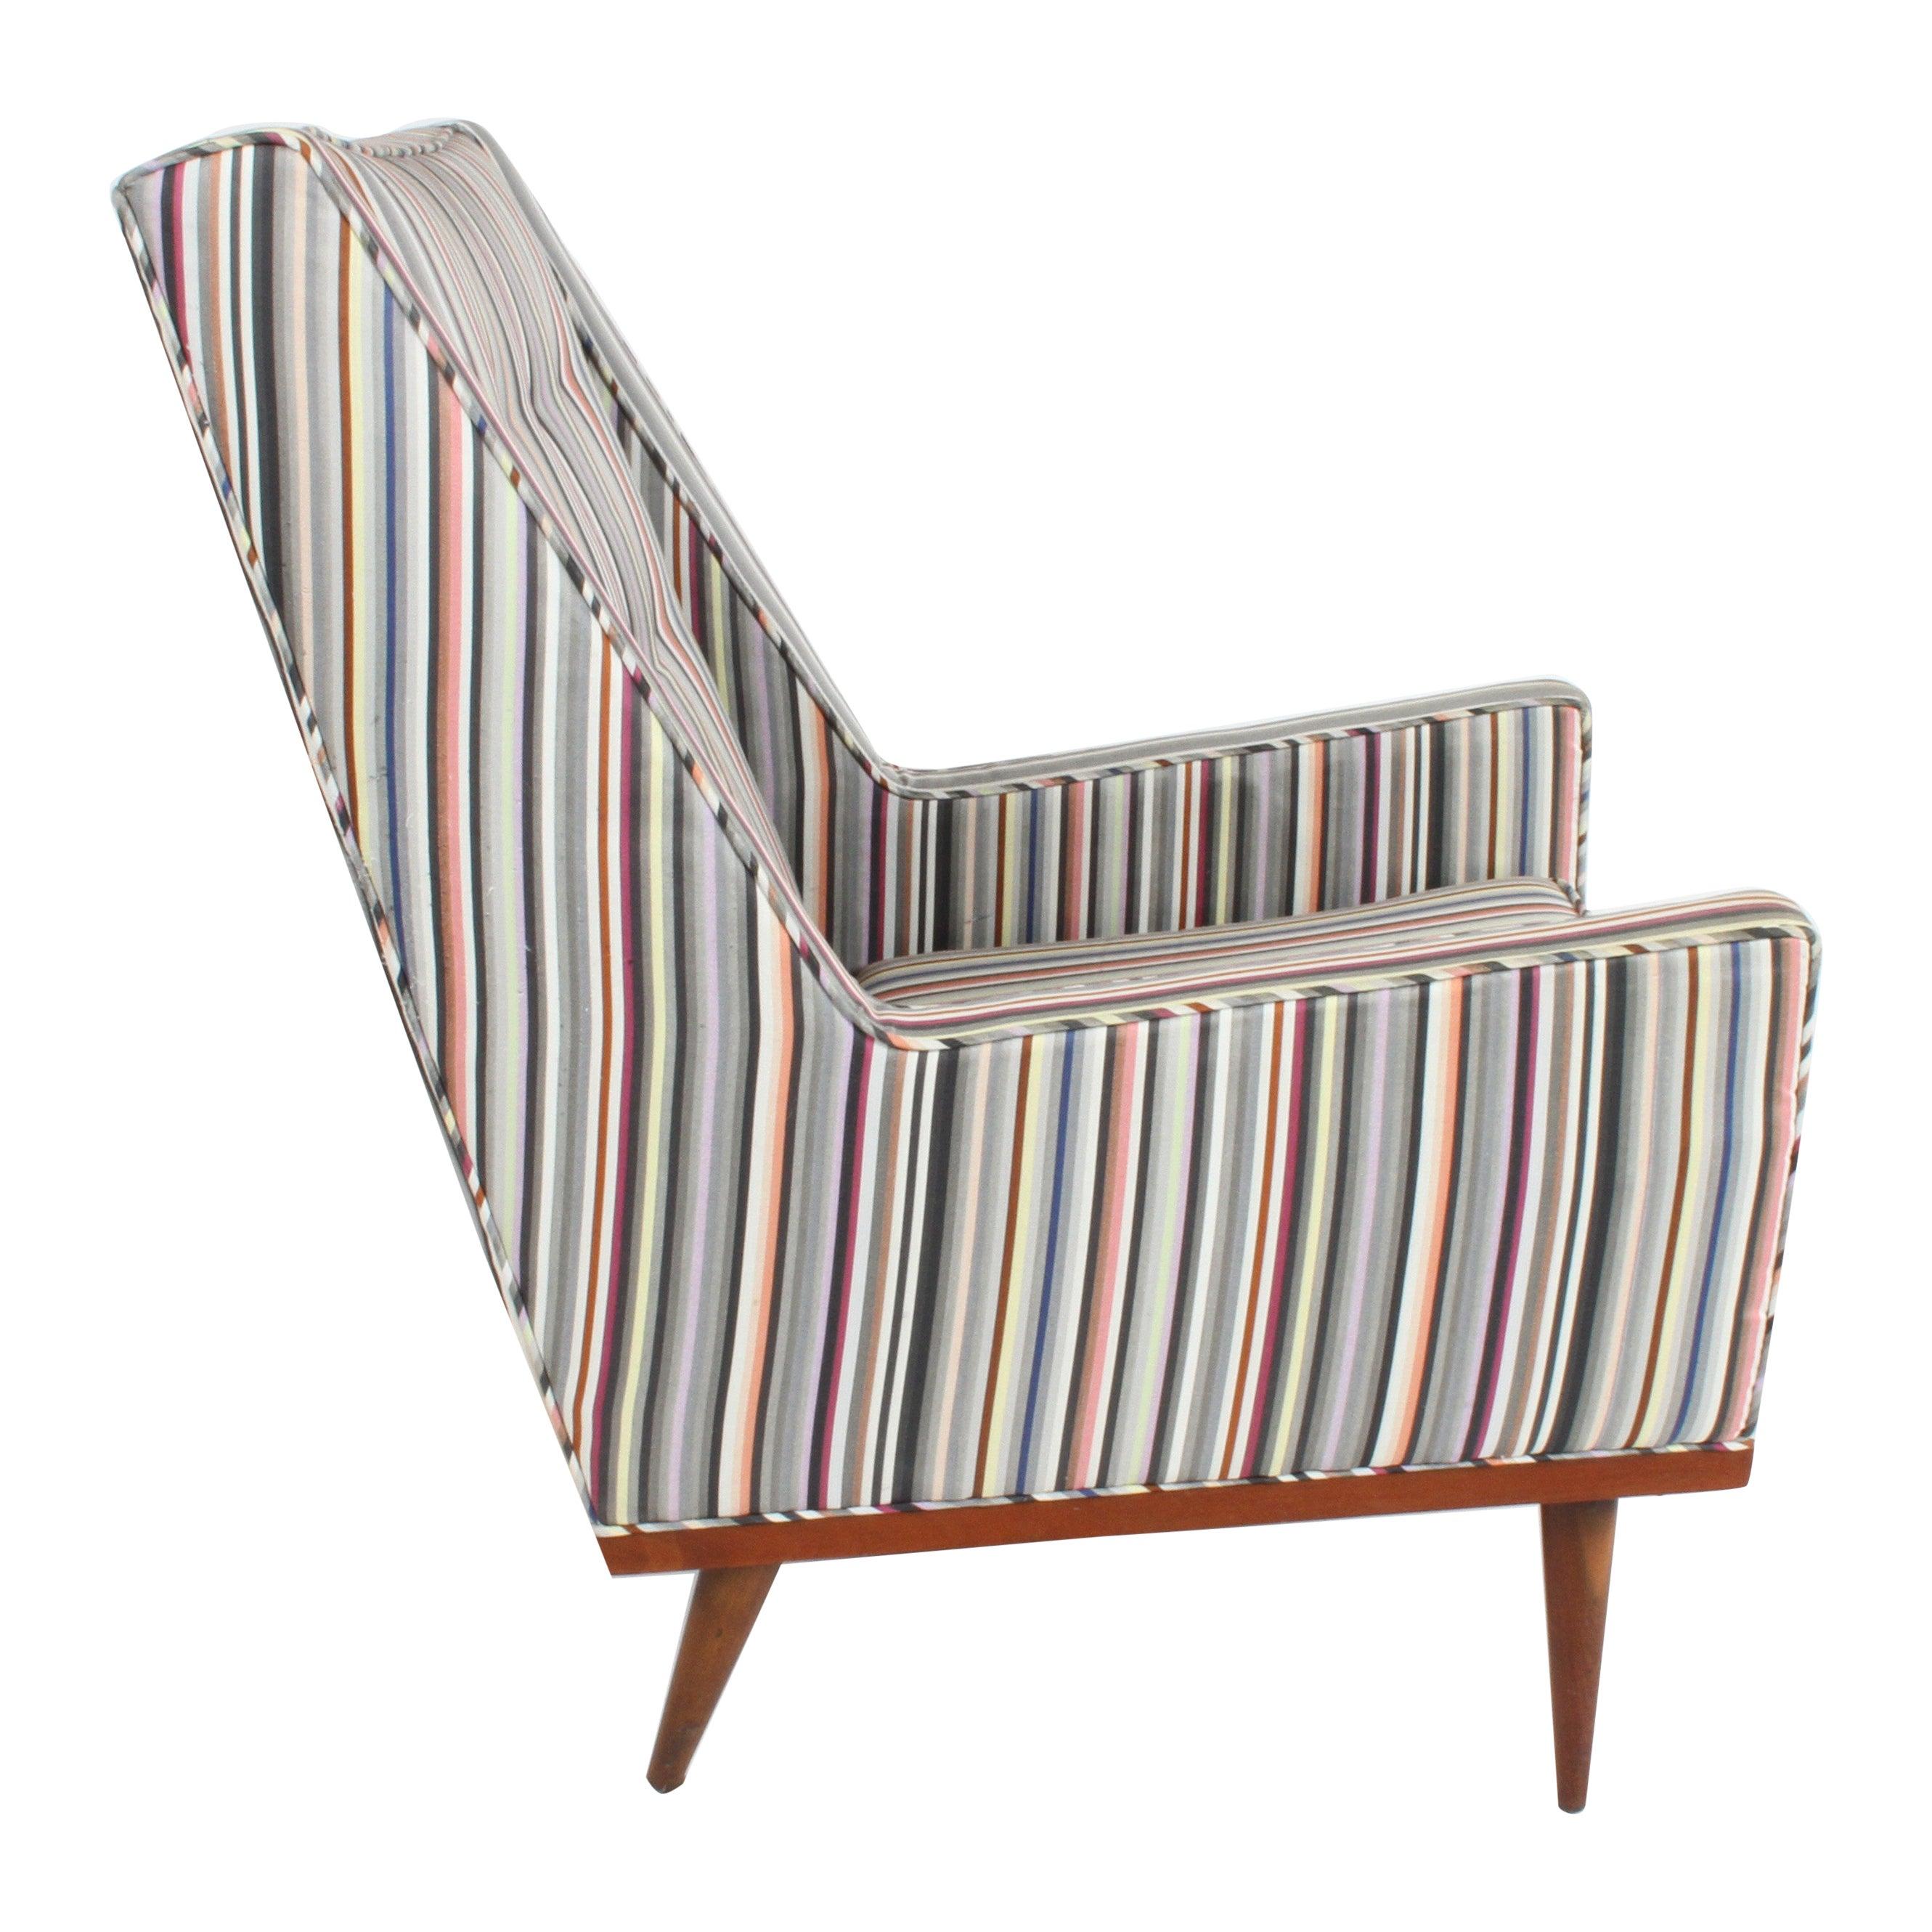 Milo Baughman for James Inc. Walnut with Stripe Lounge Chair